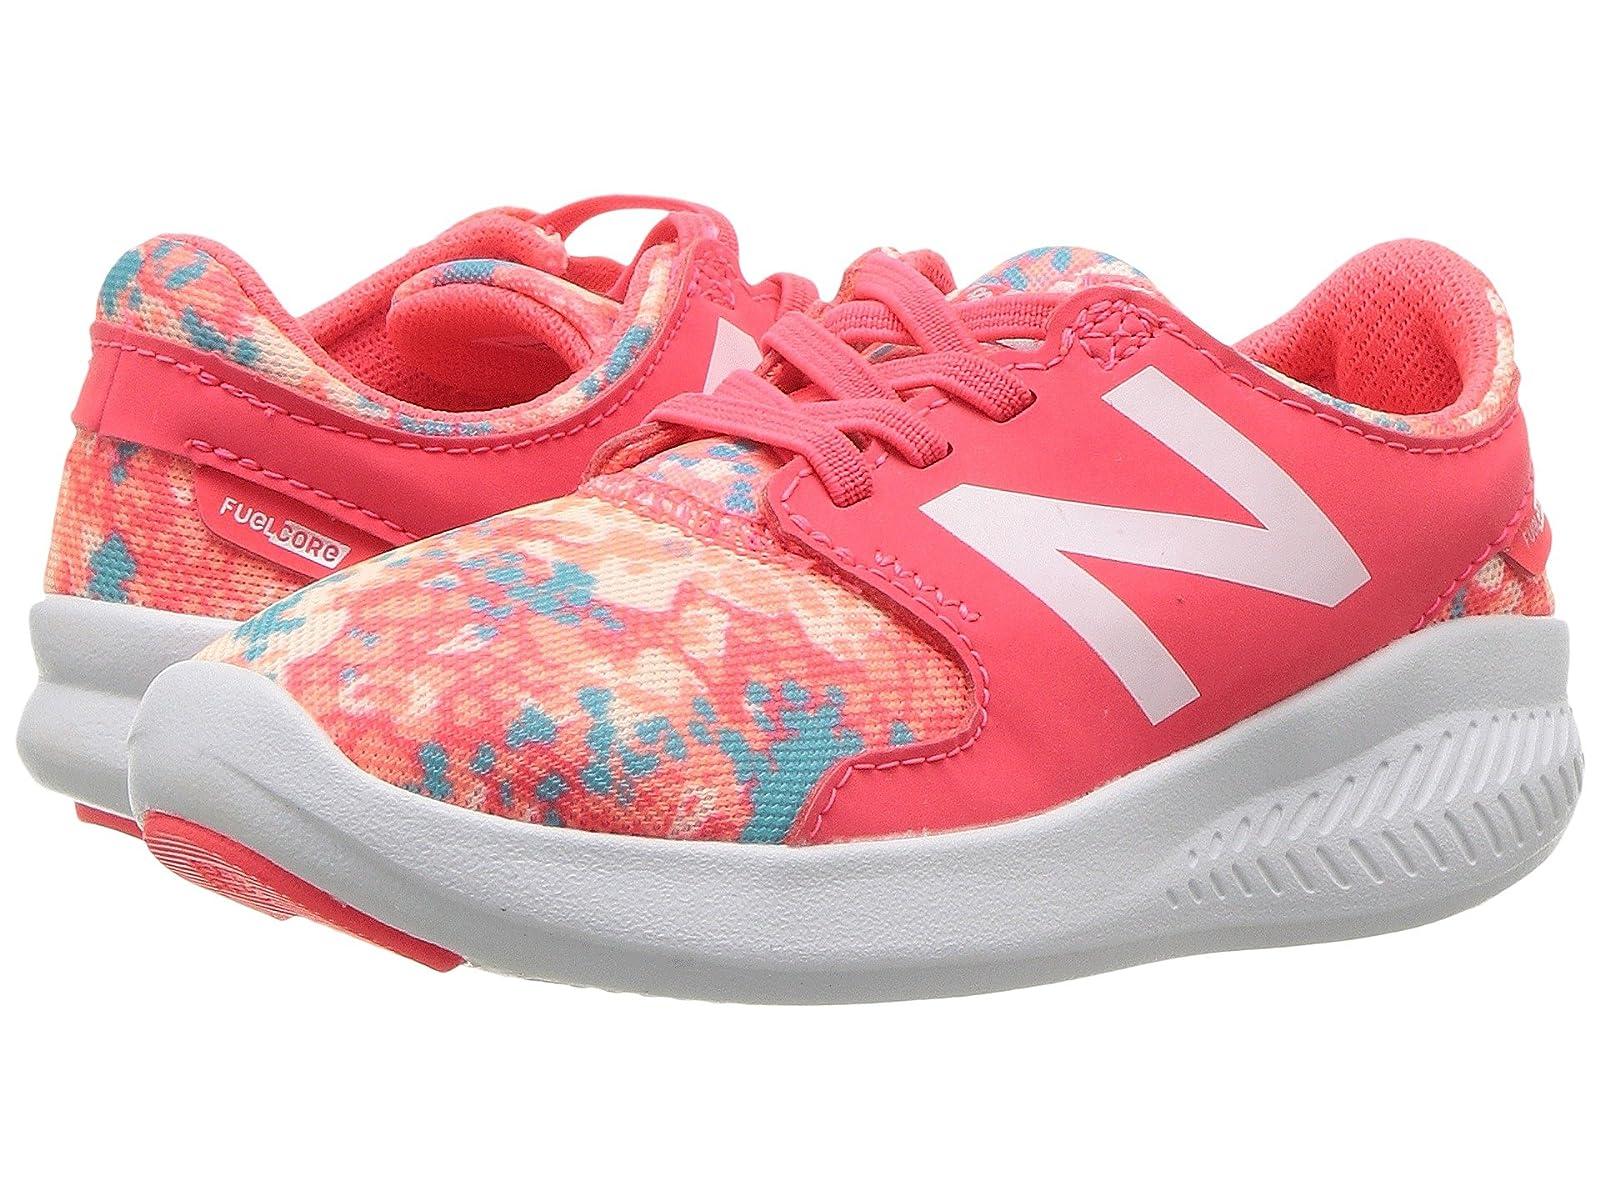 New Balance Kids KACSTv3I (Infant/Toddler)Cheap and distinctive eye-catching shoes